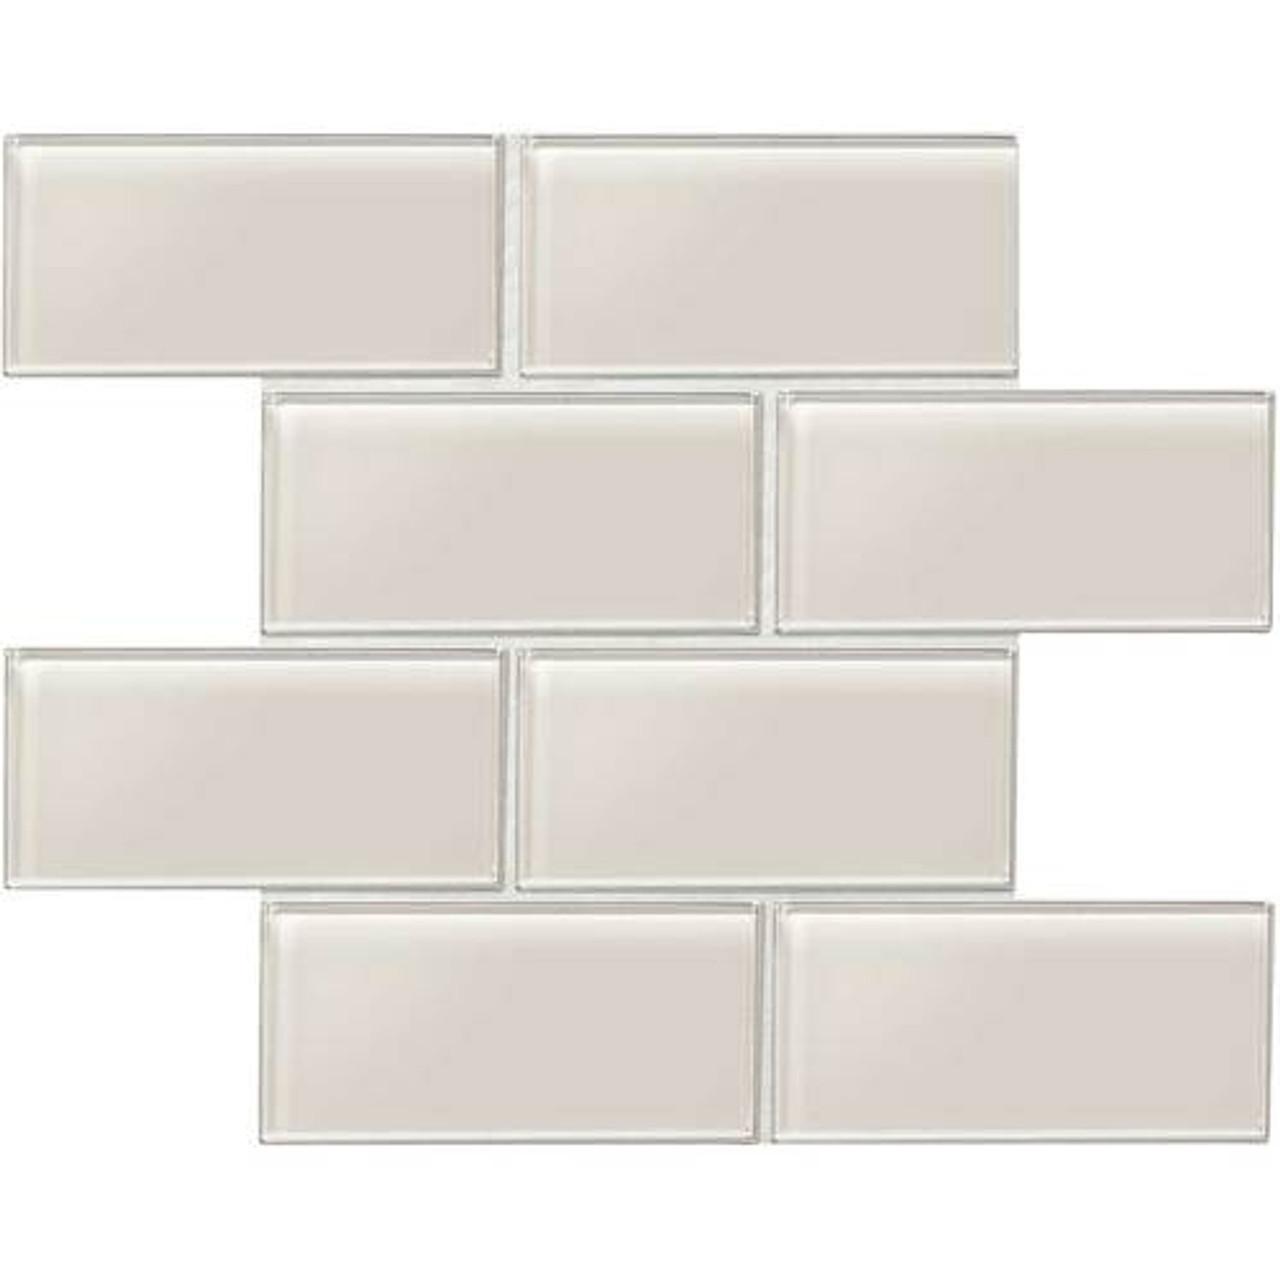 amity taupe subway glass tile 3x6